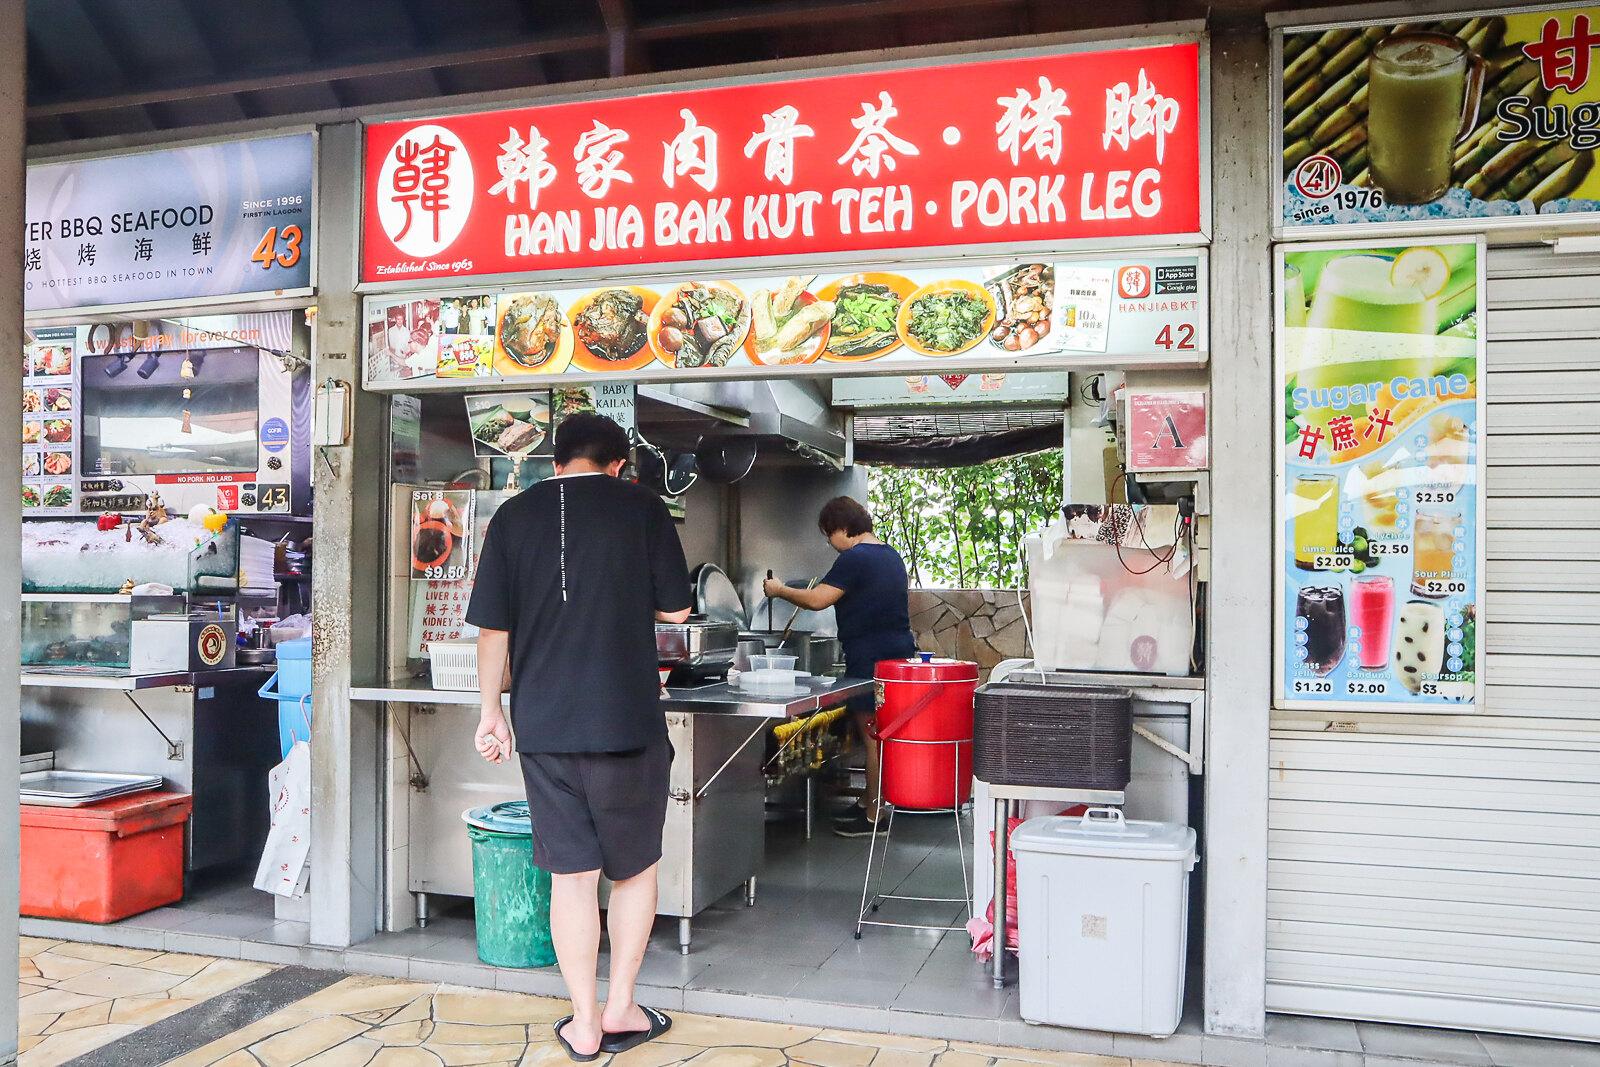 East Coast Lagoon - han jia bak kut teh storefront